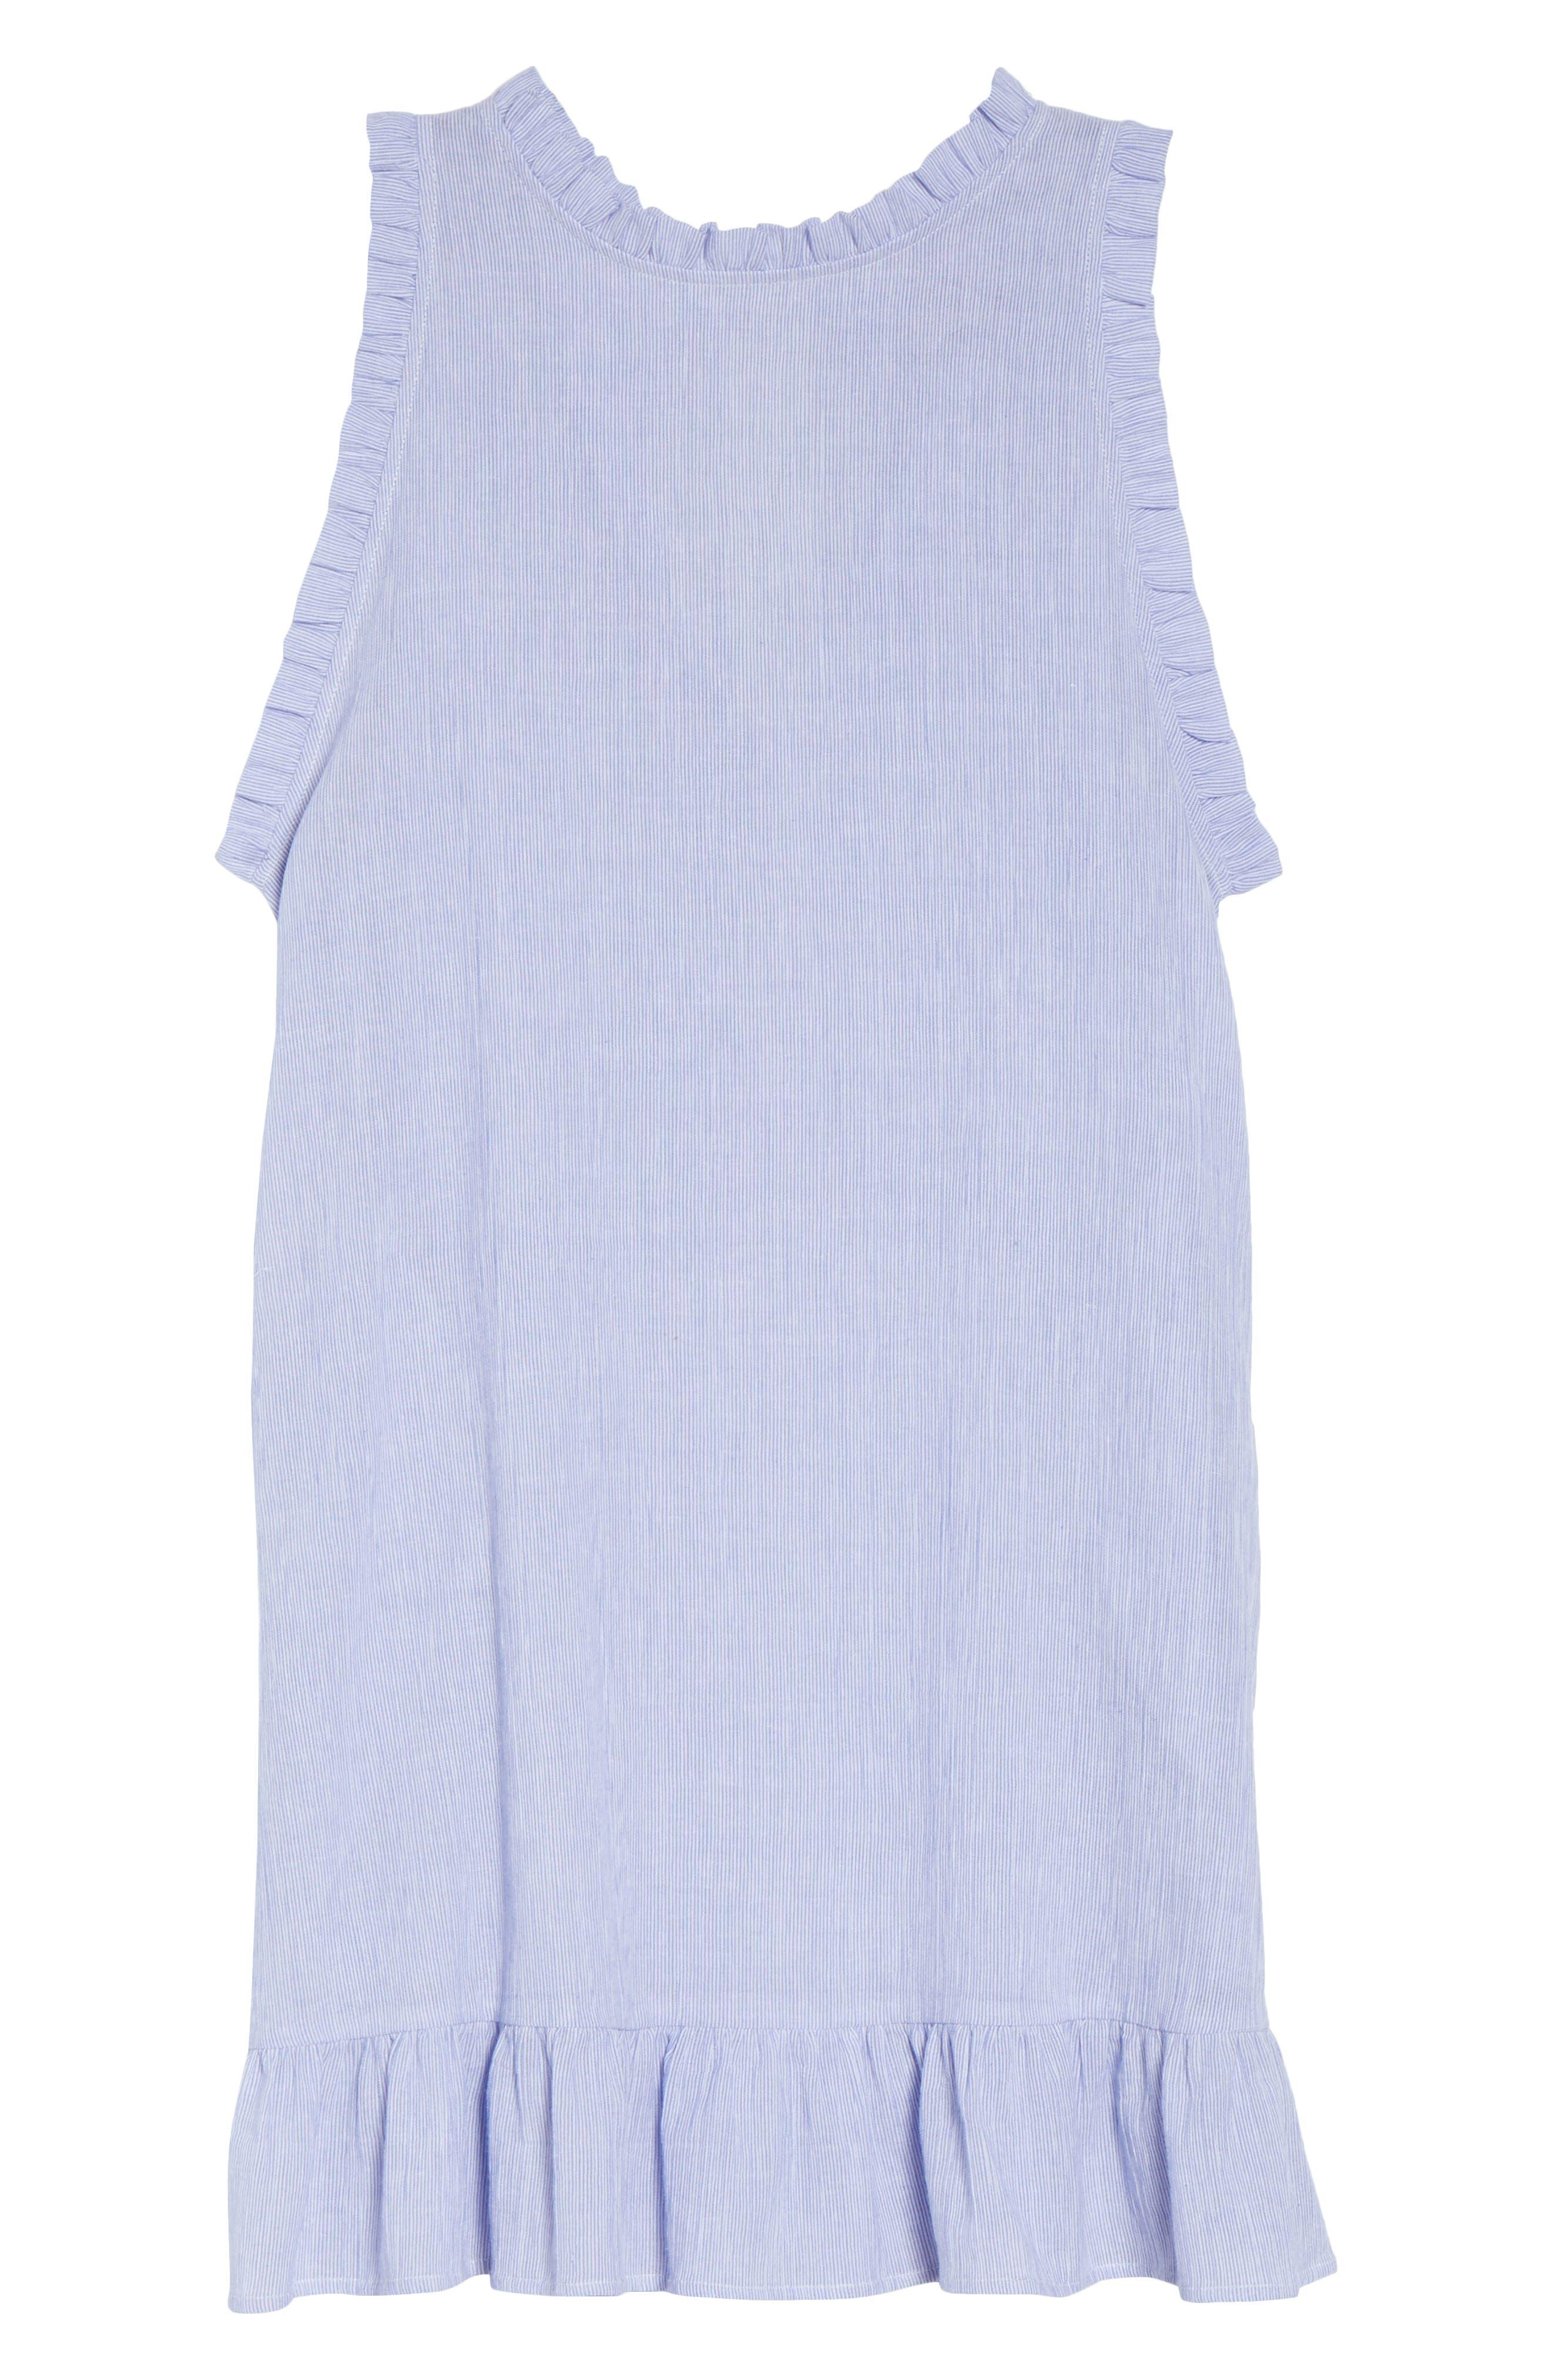 Heidi Cover-Up Dress,                             Alternate thumbnail 6, color,                             Blue/ White